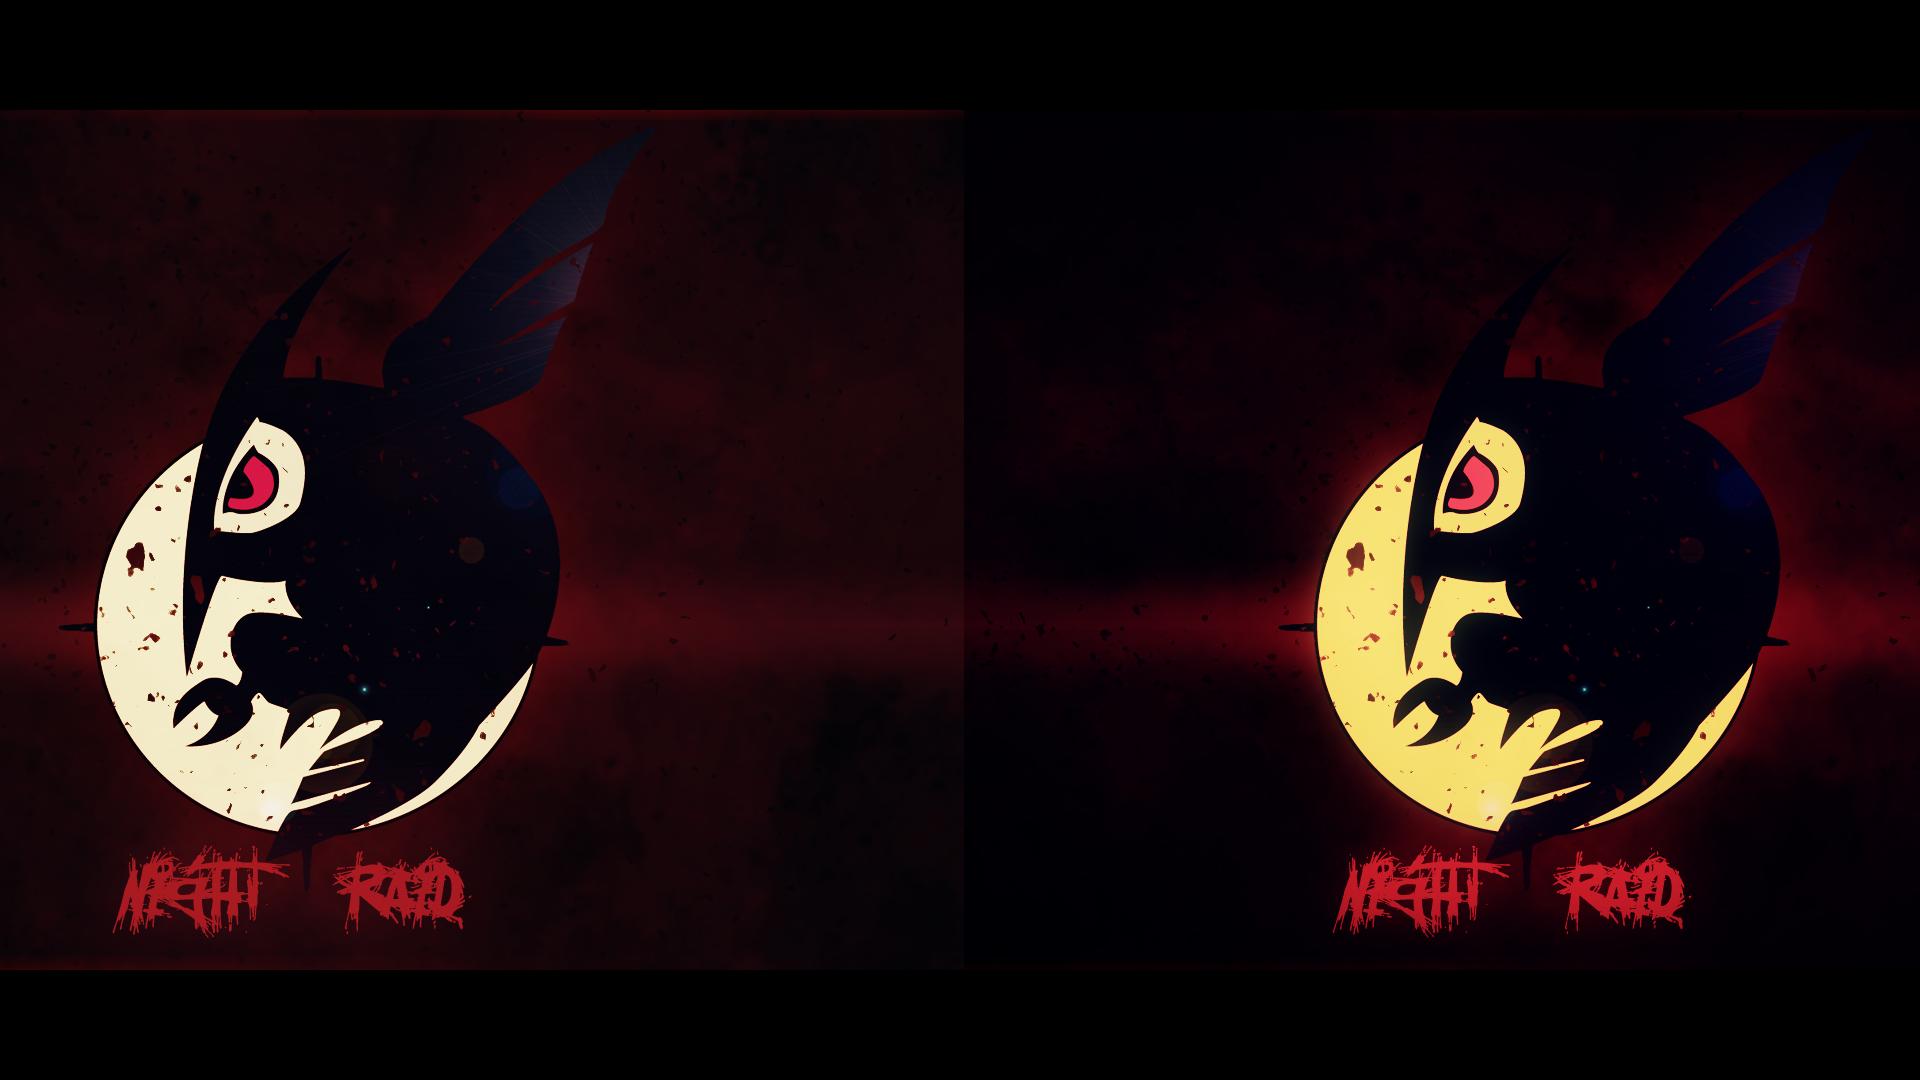 Night Wallpaper No Logo By Ualgreymon On Deviantart: Akame Ga Kill: Night Raid Logo Wallpaper Pack By